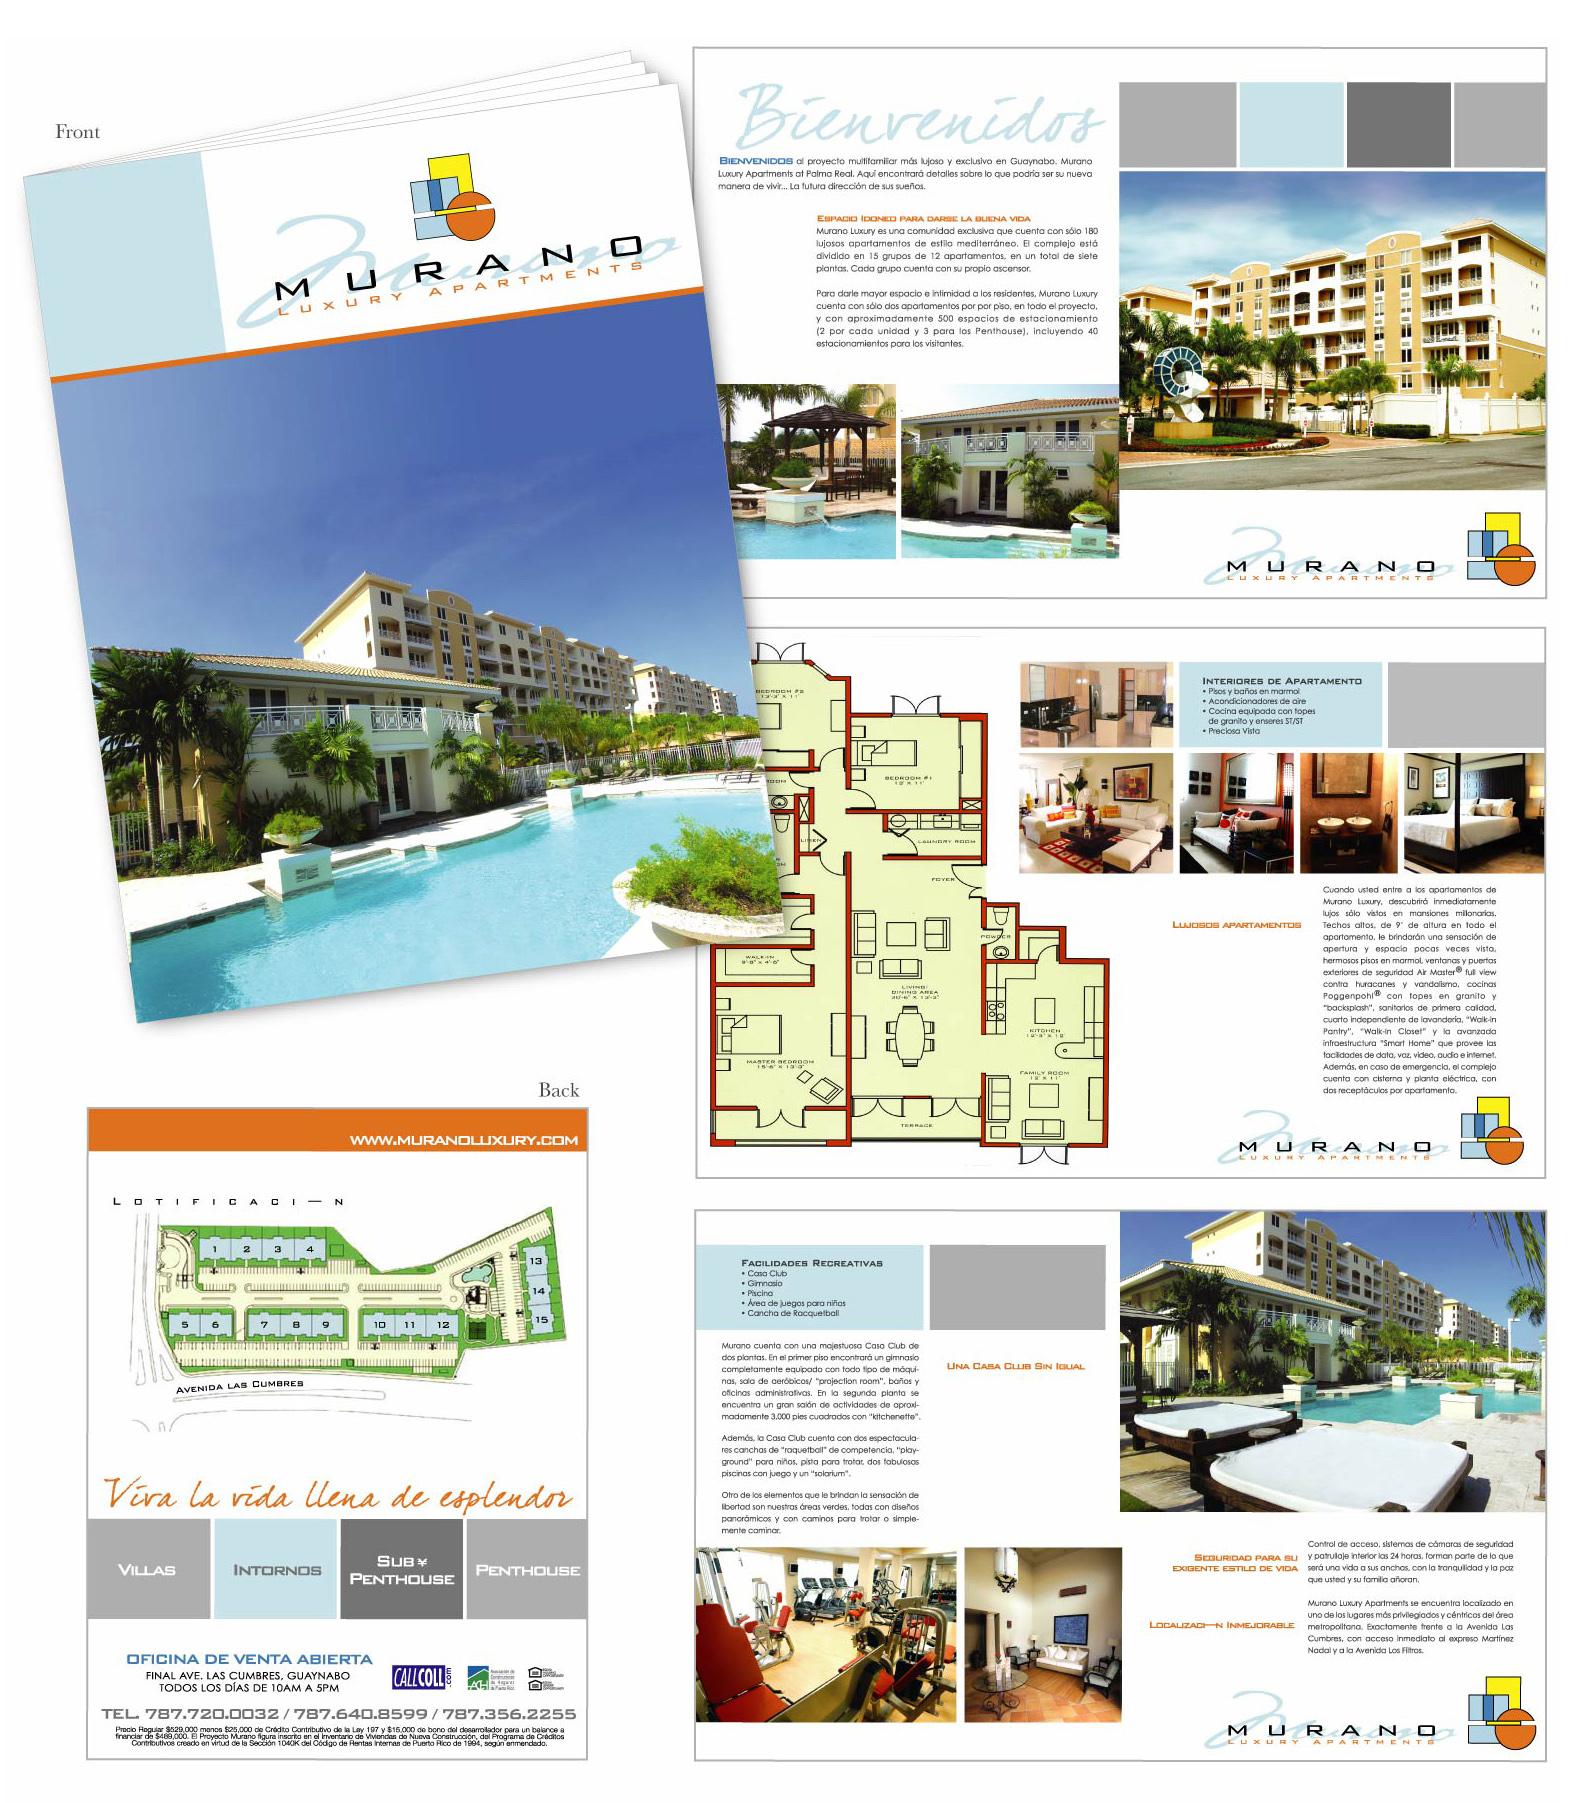 Murano Apartments: Brochures And Menus By Maria Isabel Oliver At Coroflot.com